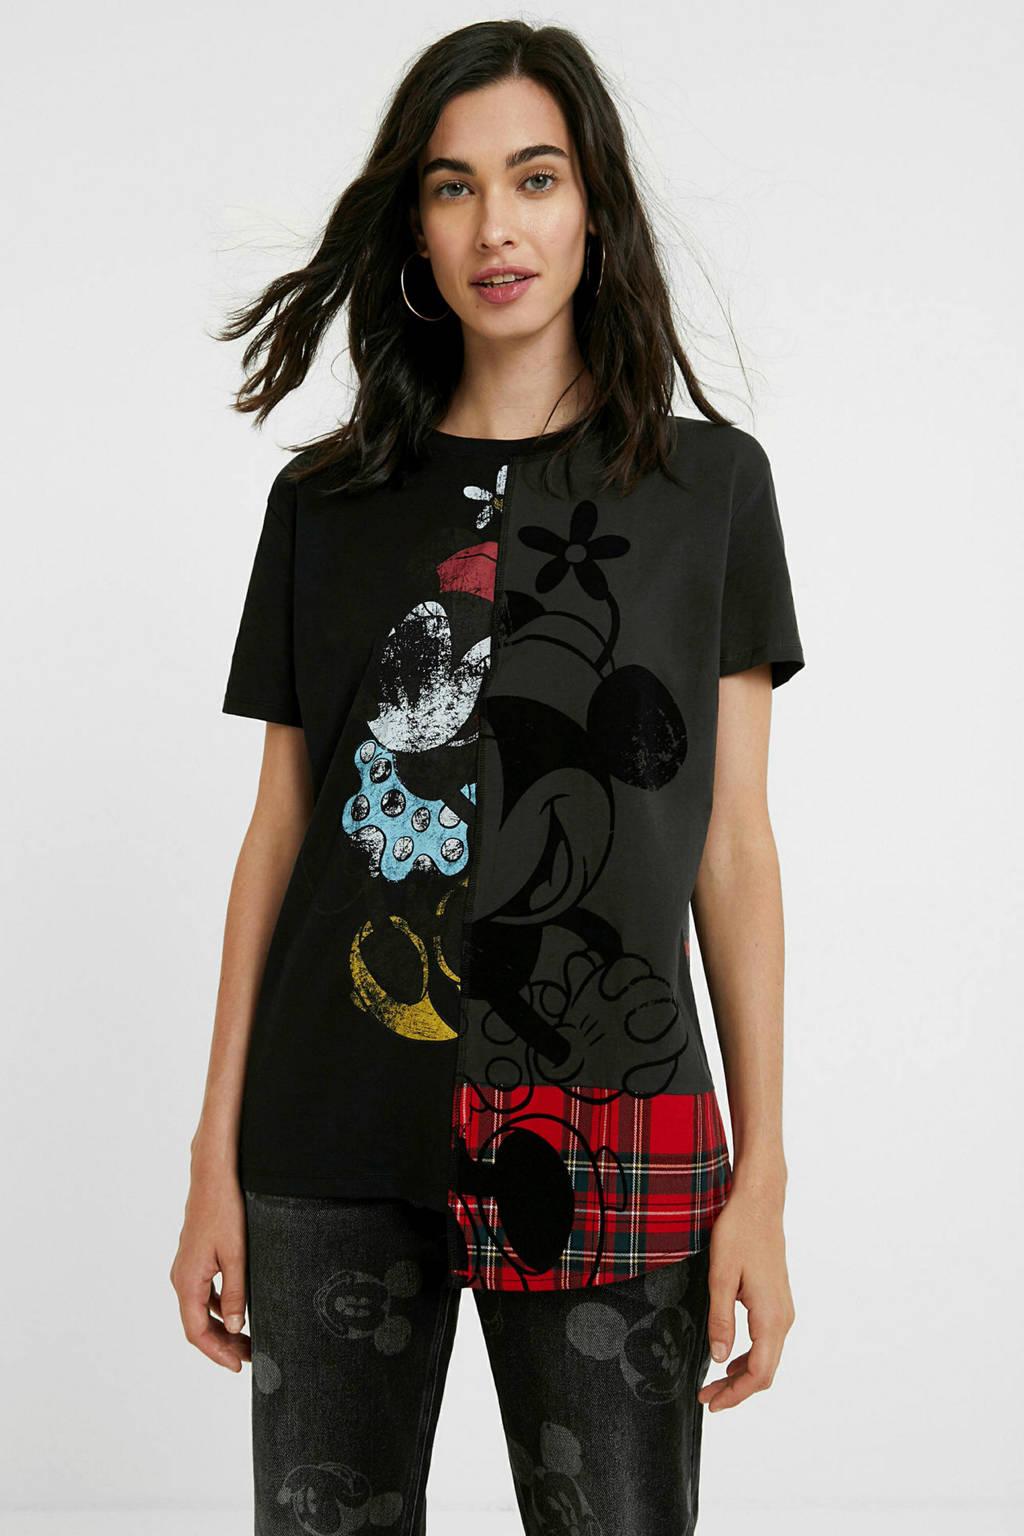 Desigual Mickey Mouse T-shirt met printopdruk zwart/rood/antraciet, Zwart/rood/antraciet